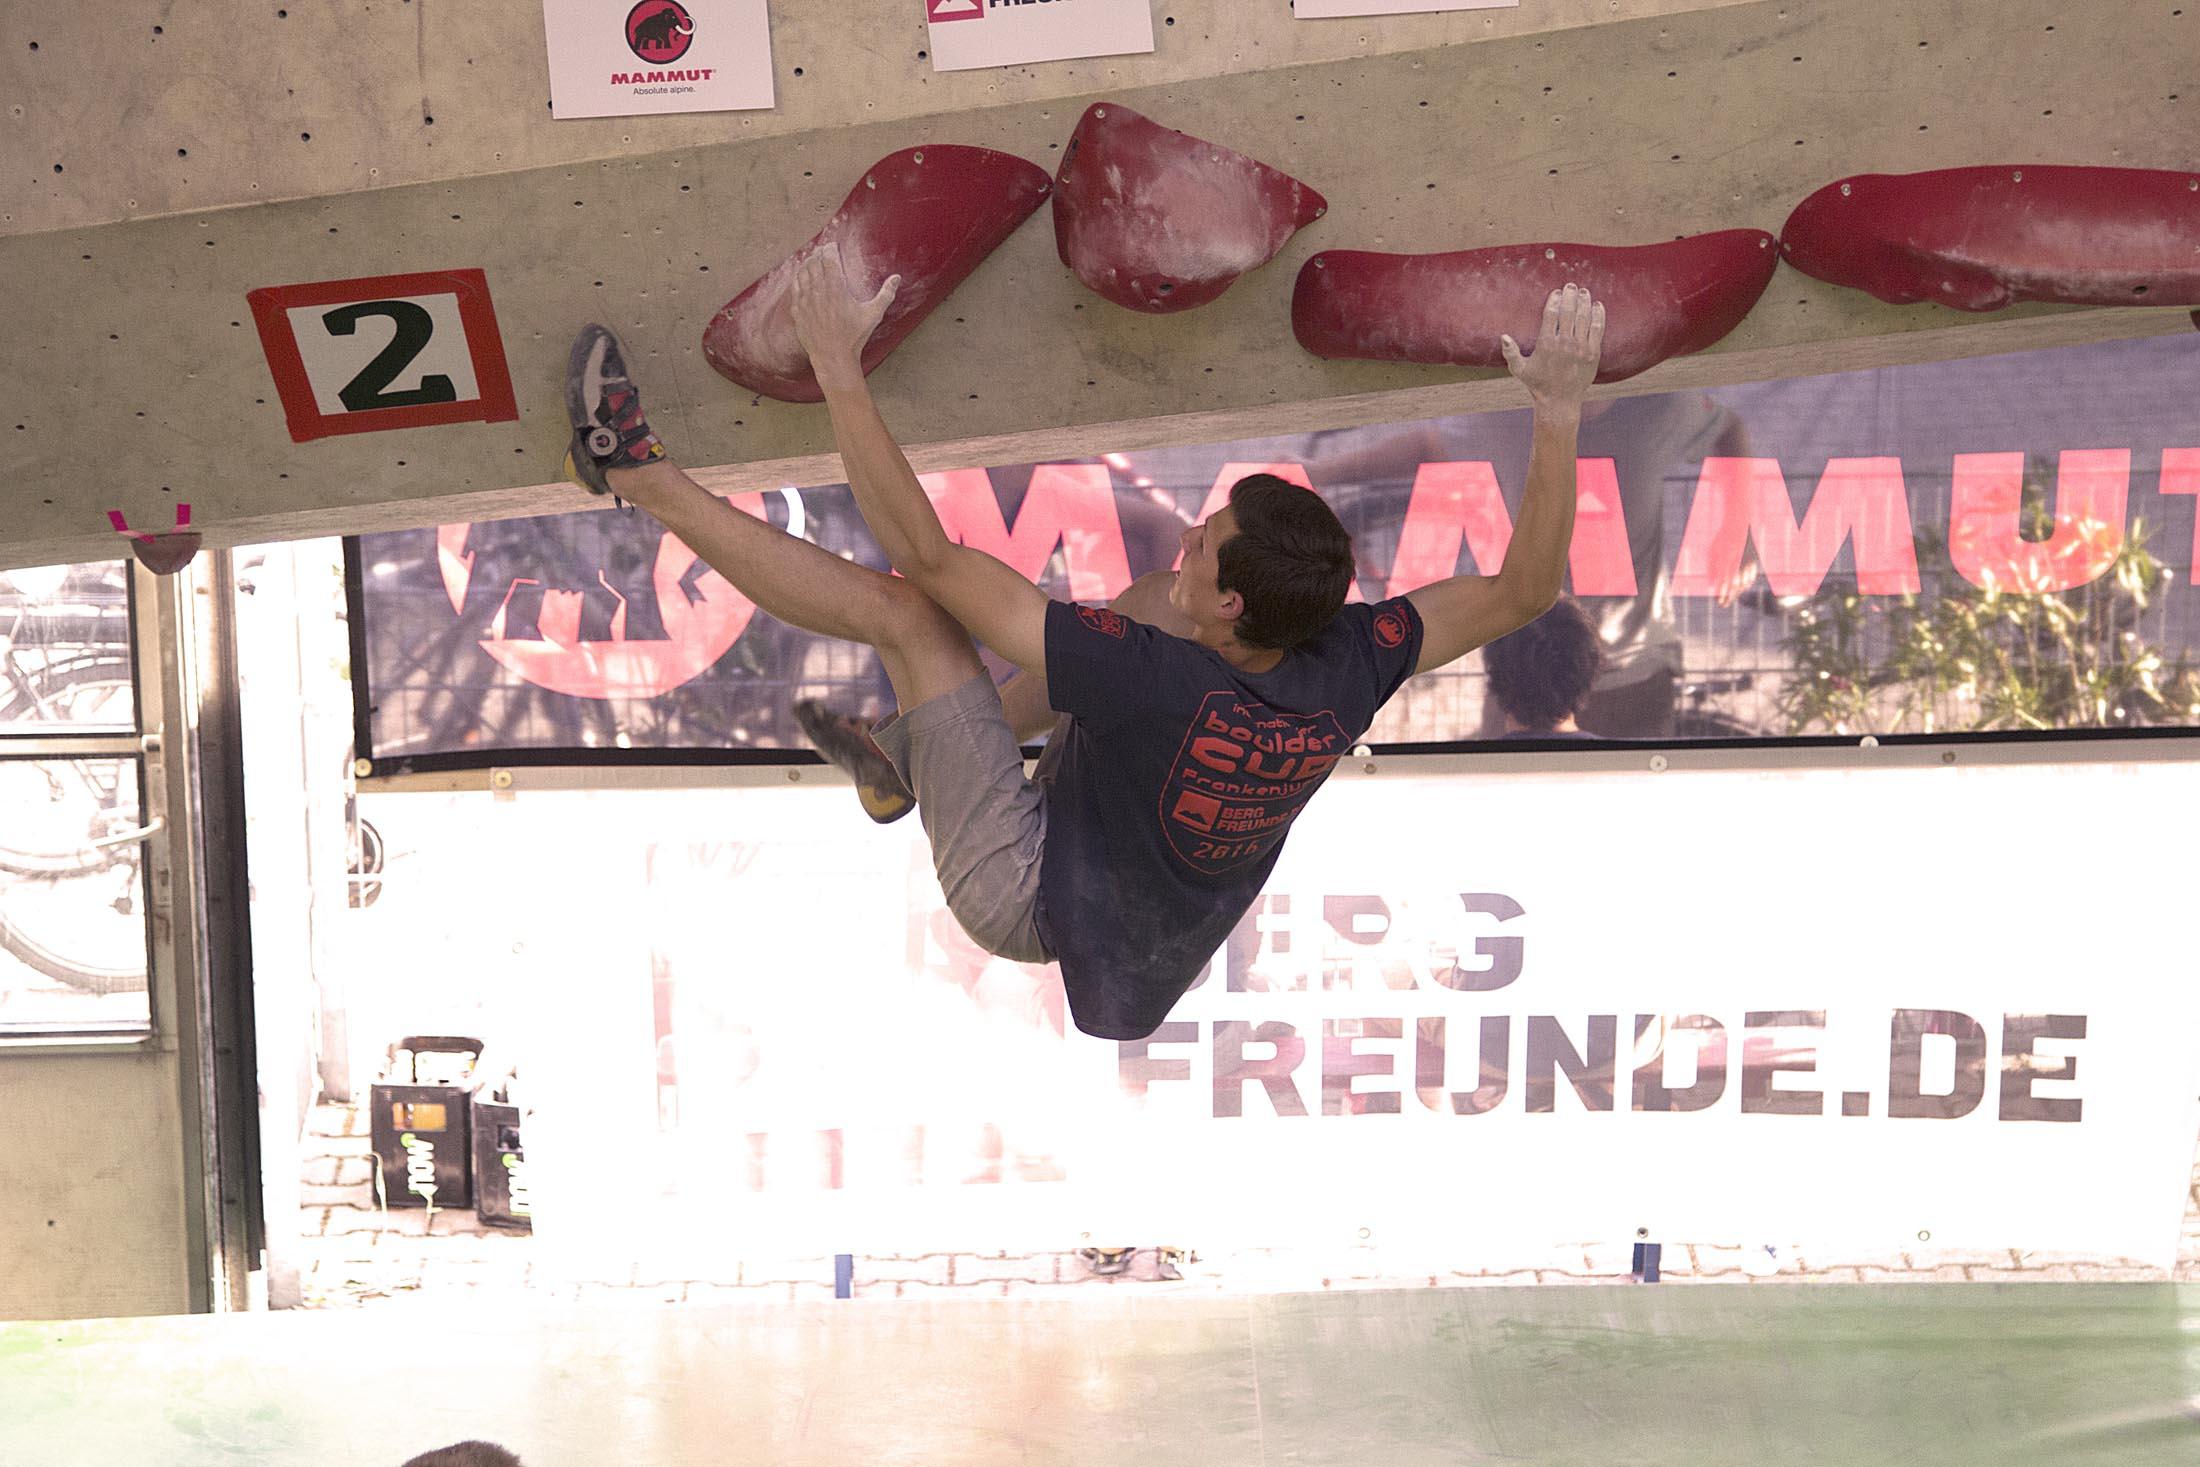 Finale, internationaler bouldercup Frankenjura 2016, BLOCKHELDEN Erlangen, Mammut, Bergfreunde.de, Boulderwettkampf07092016621